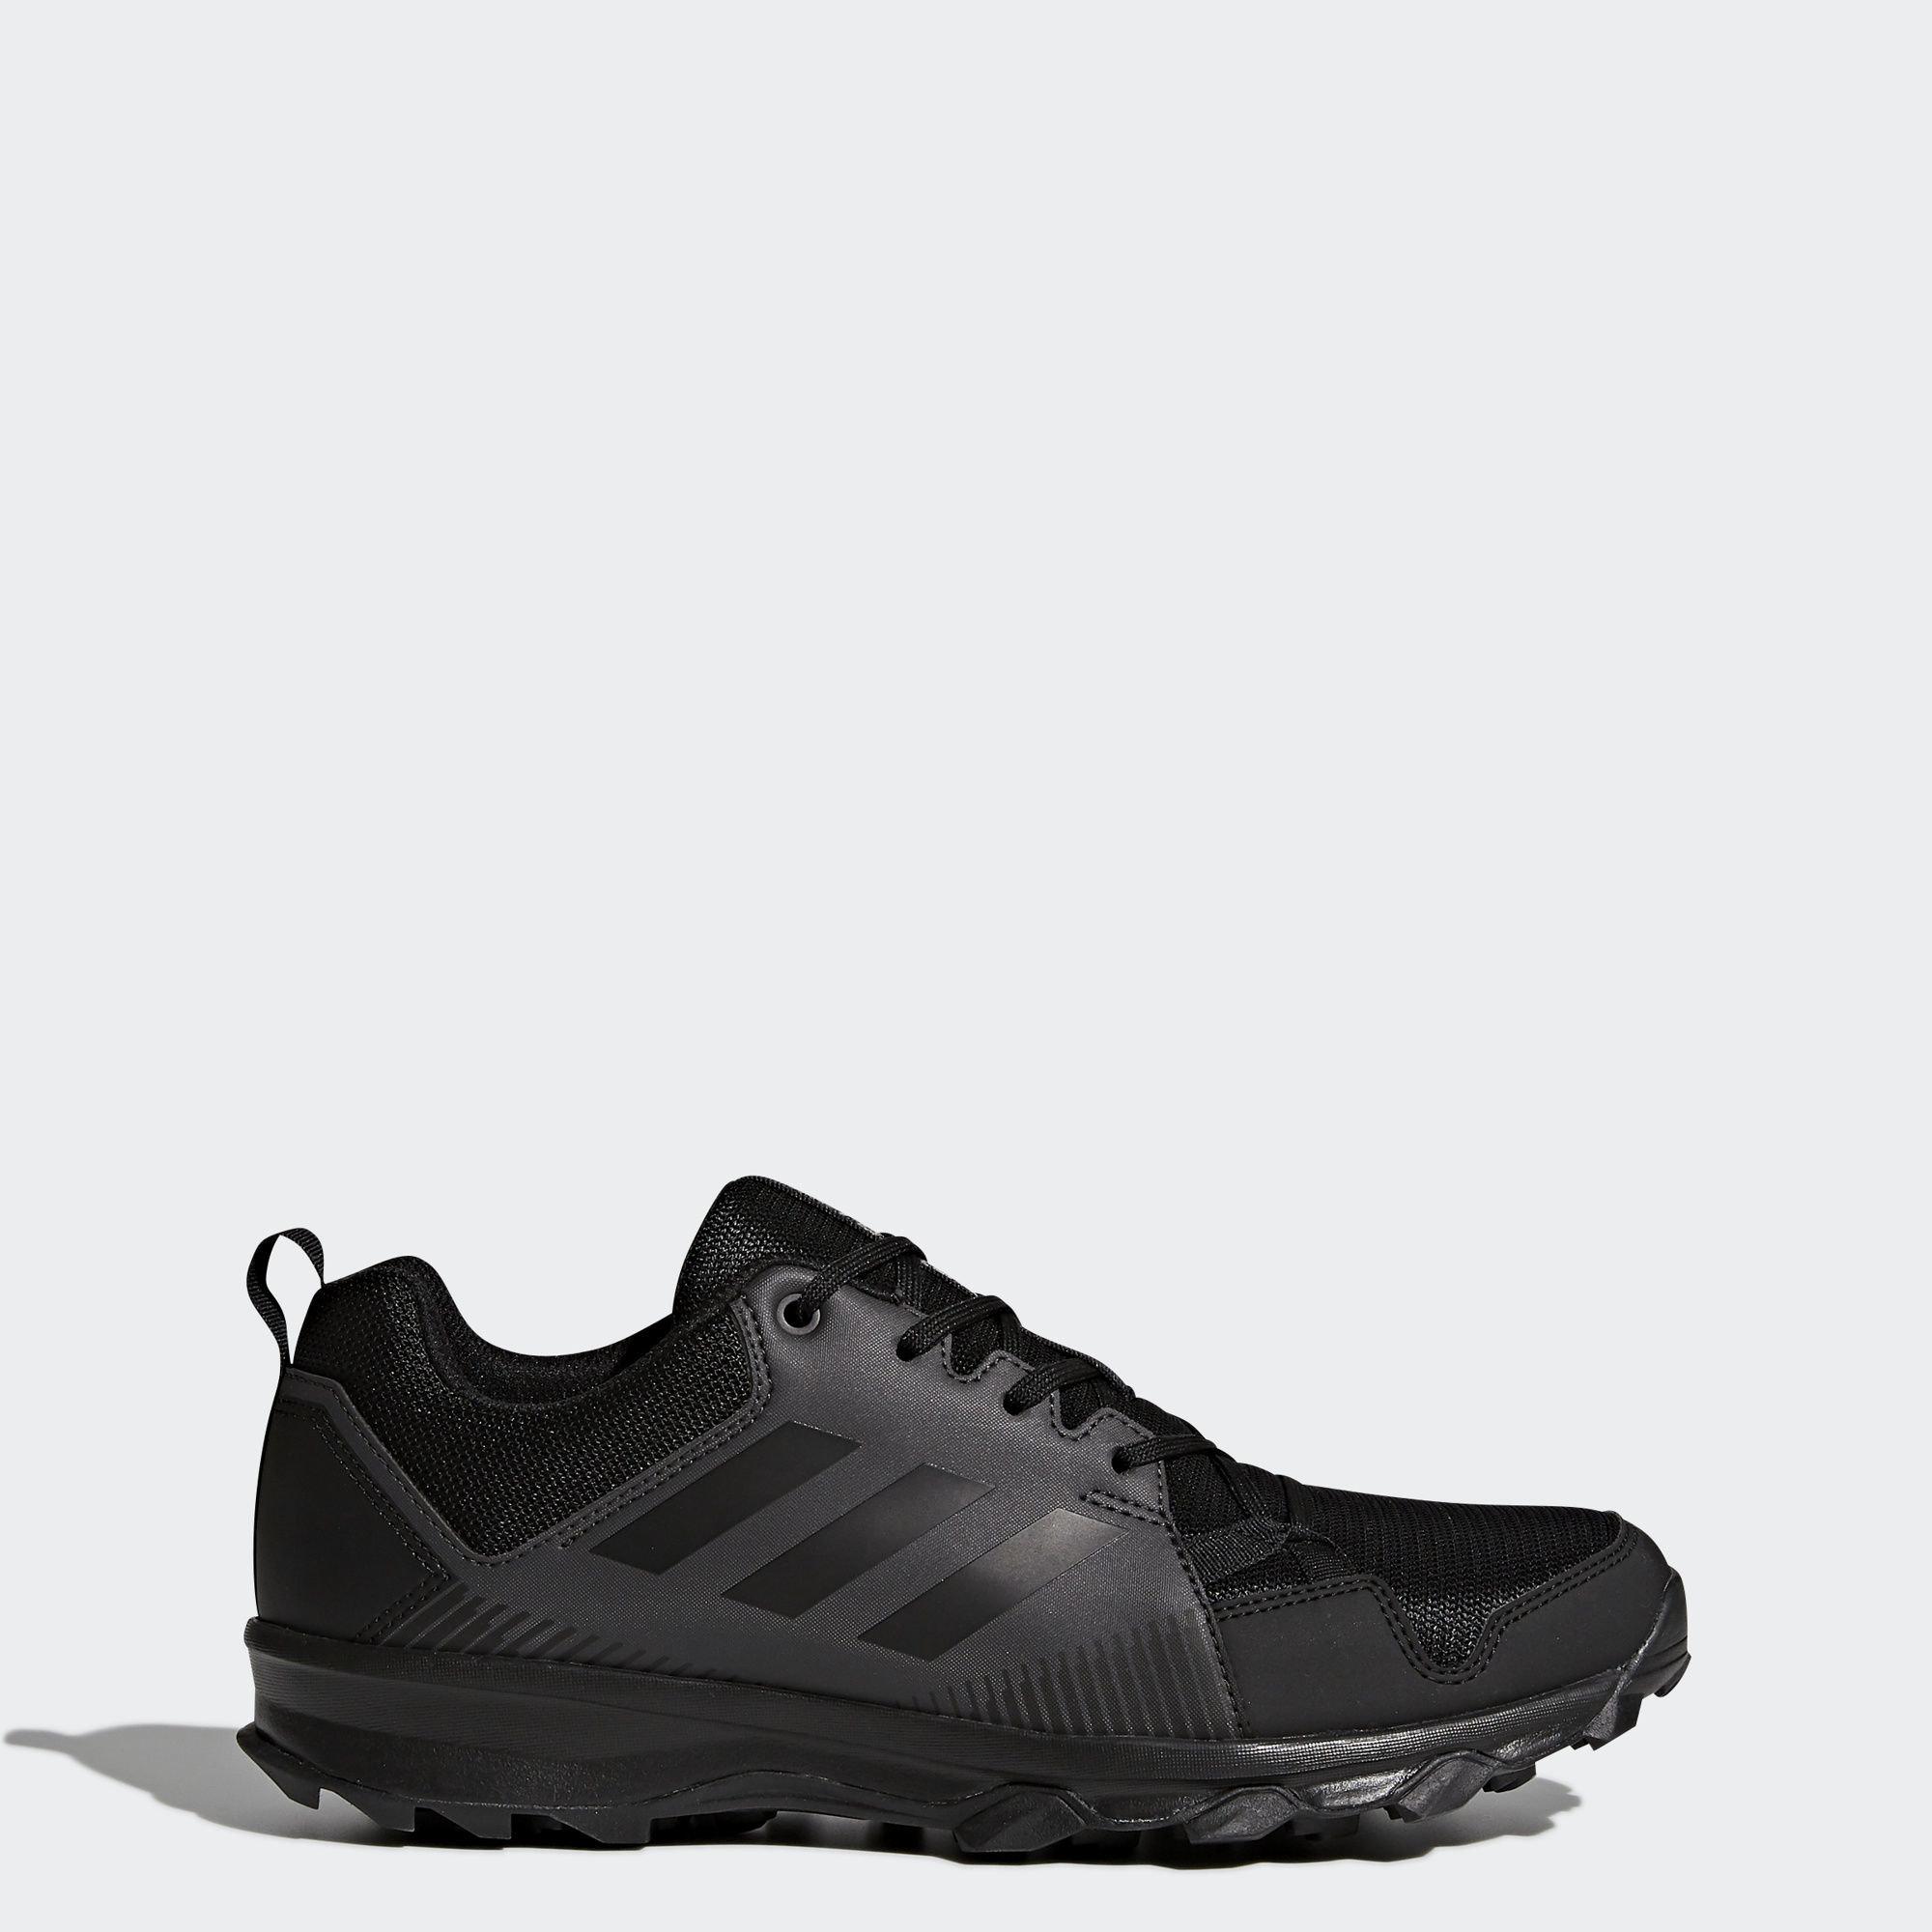 Обувь для трейлраннинга TERREX Tracerocker adidas TERREX Core Black/Core Black/Utility Black